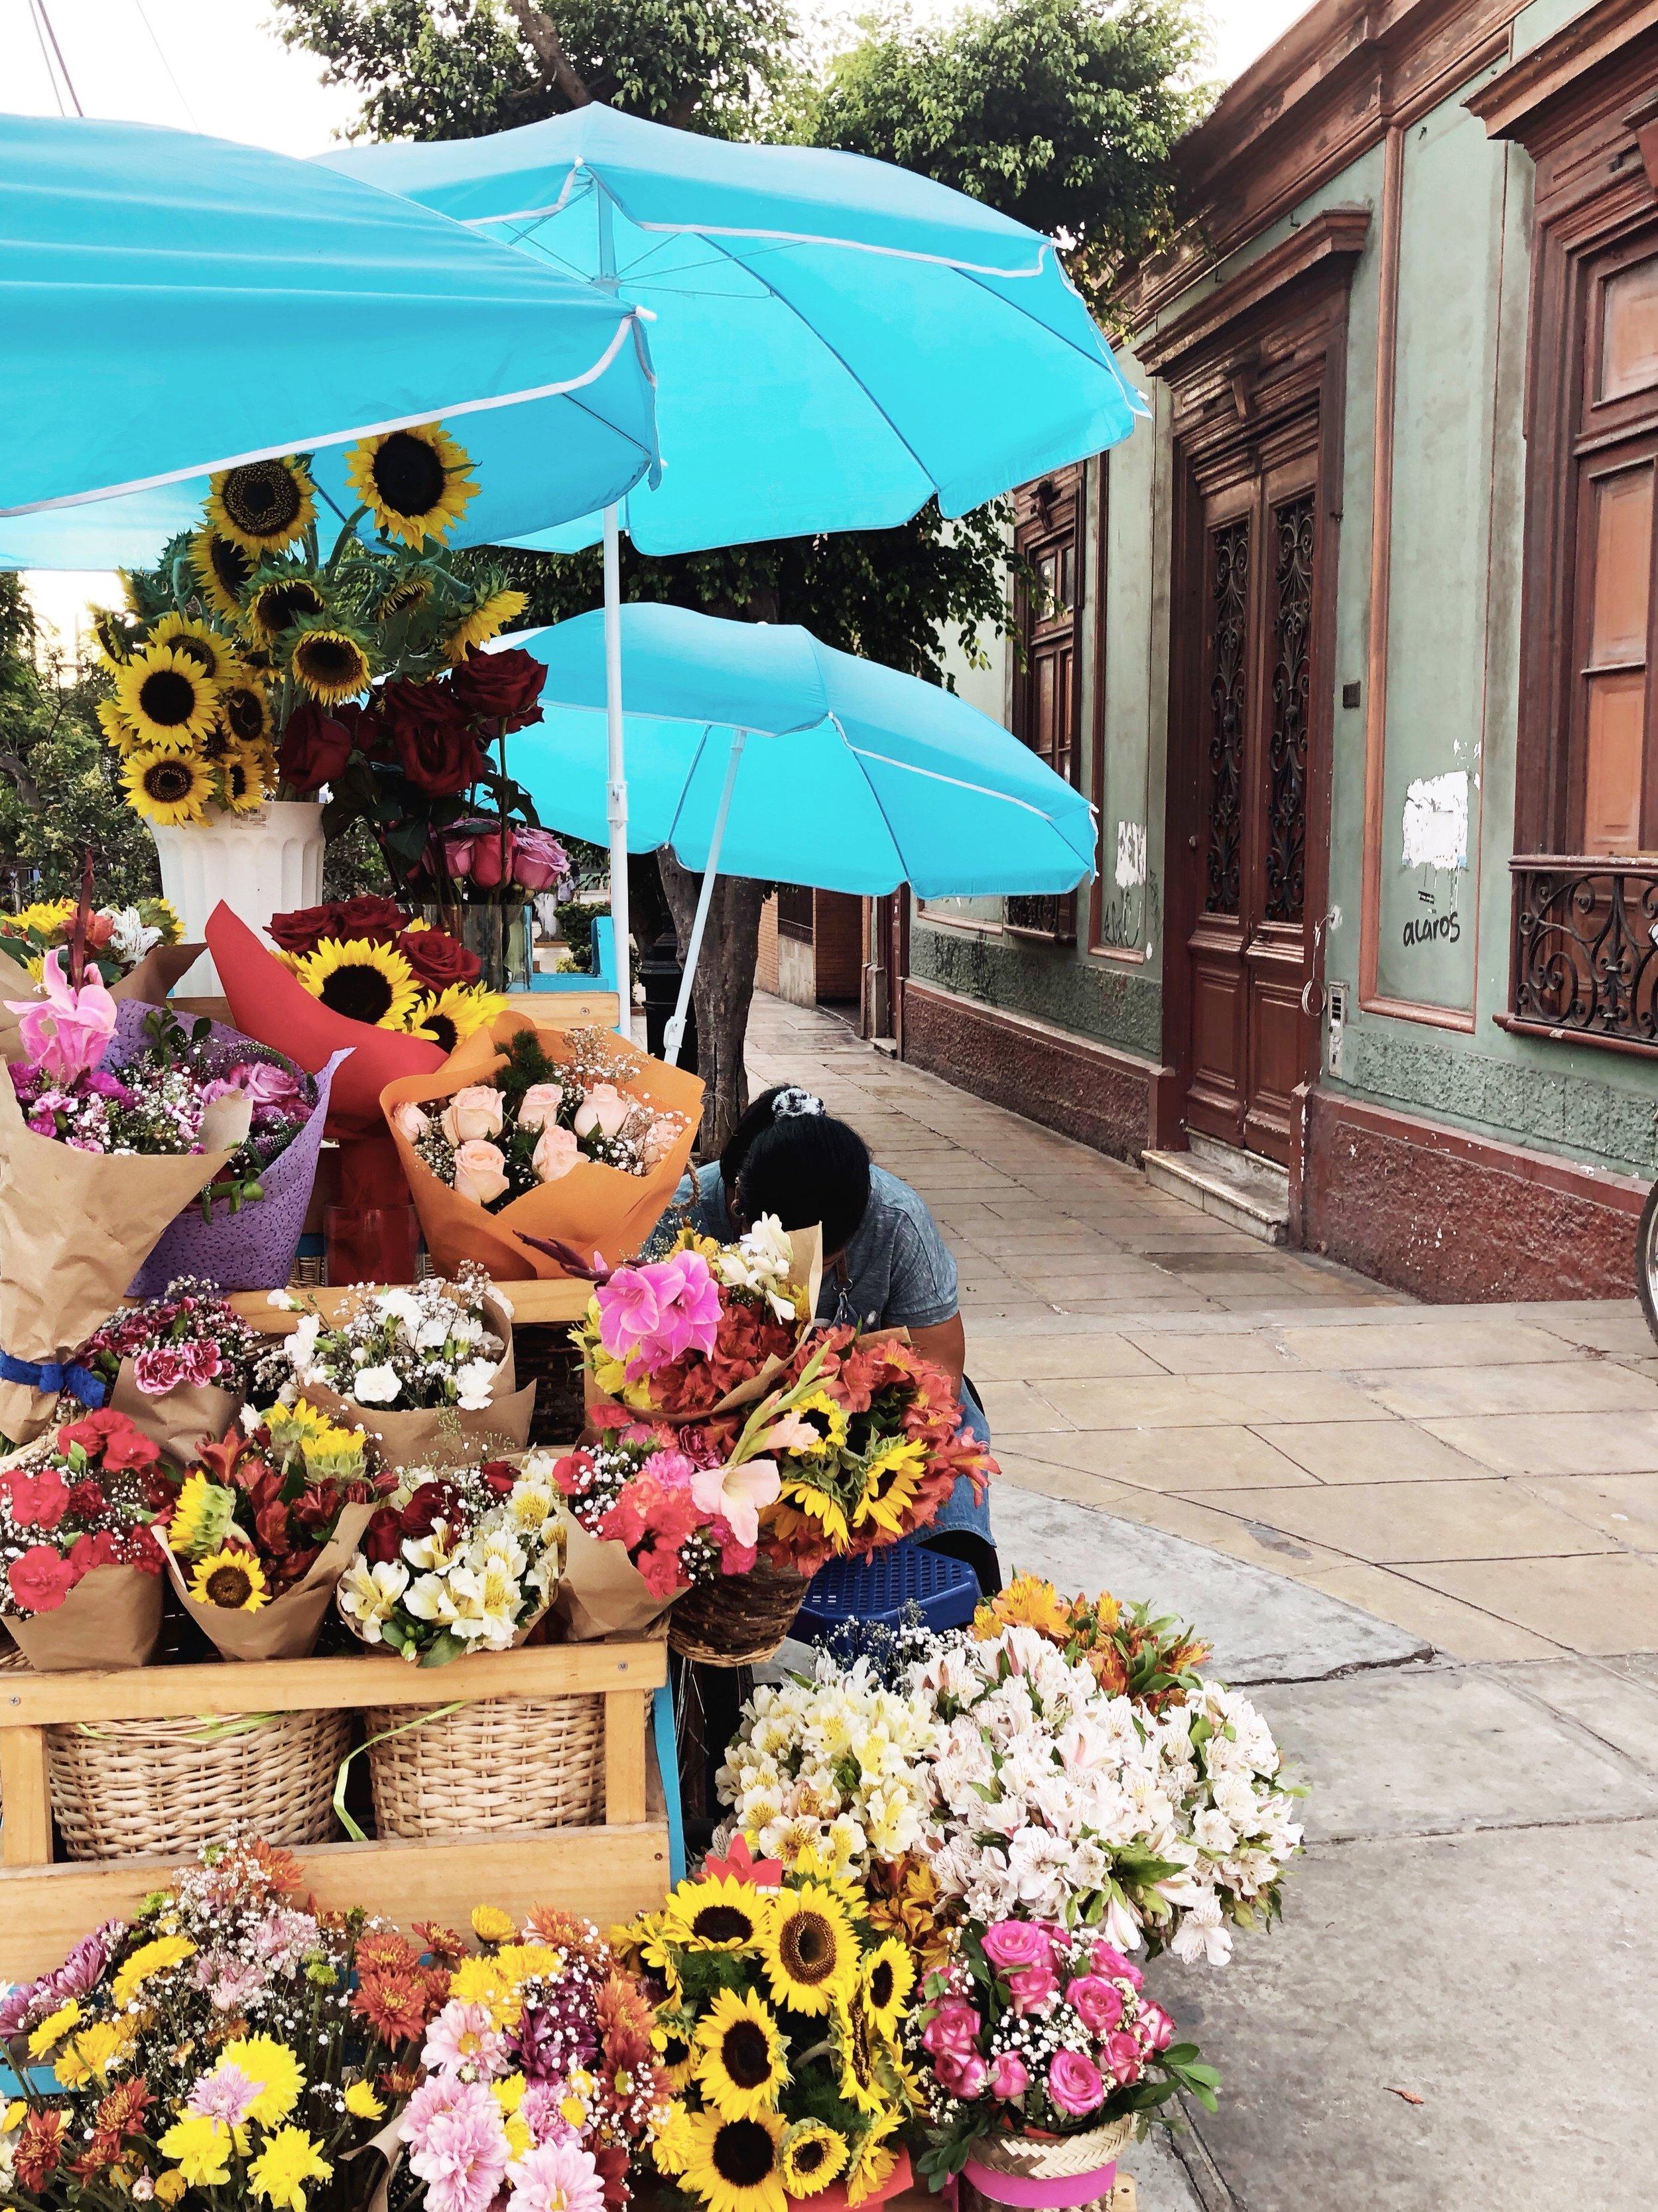 barranco-south america-lima-peru-flowers-travel tips